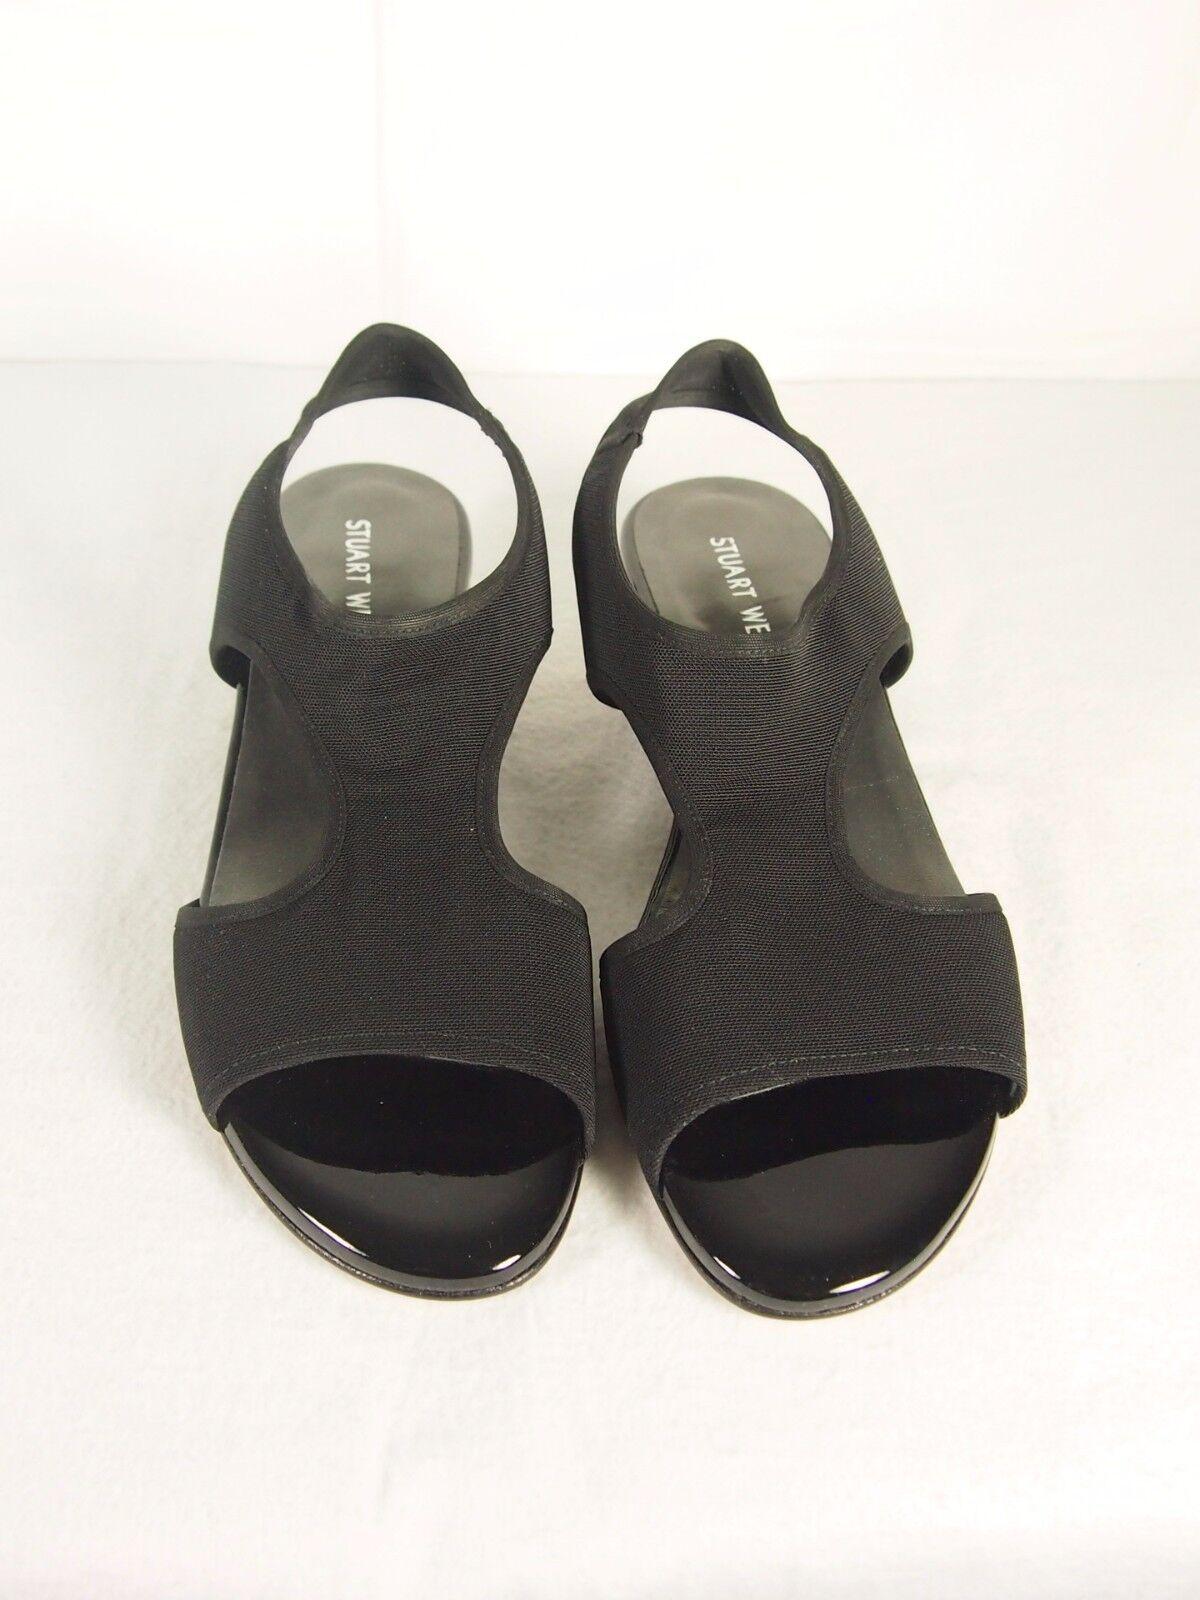 STUART WEITZMAN Giver Demi Stretch Sandal Black Sz 6.5 Reg 355.00